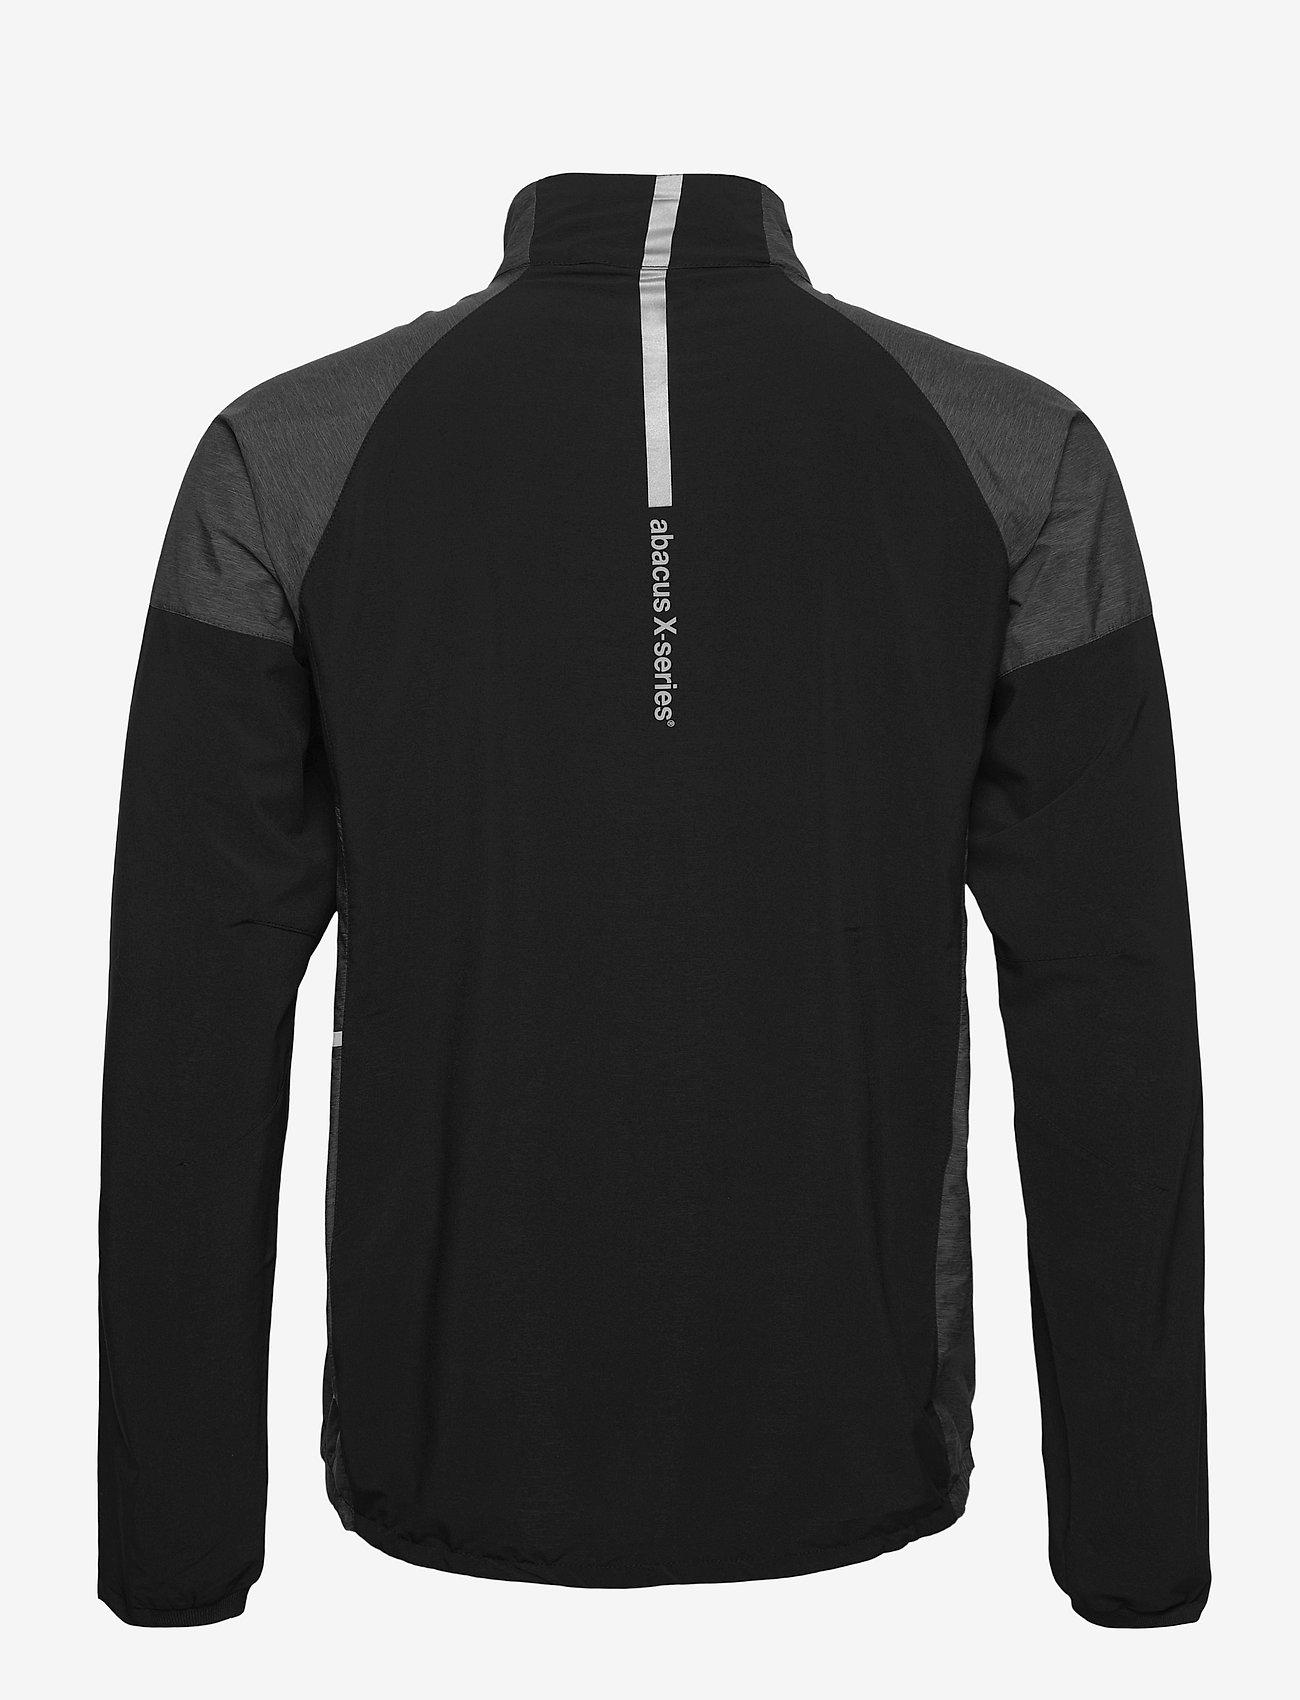 Abacus - Mens Edge 37.5 windjacket - golf jackets - black - 1